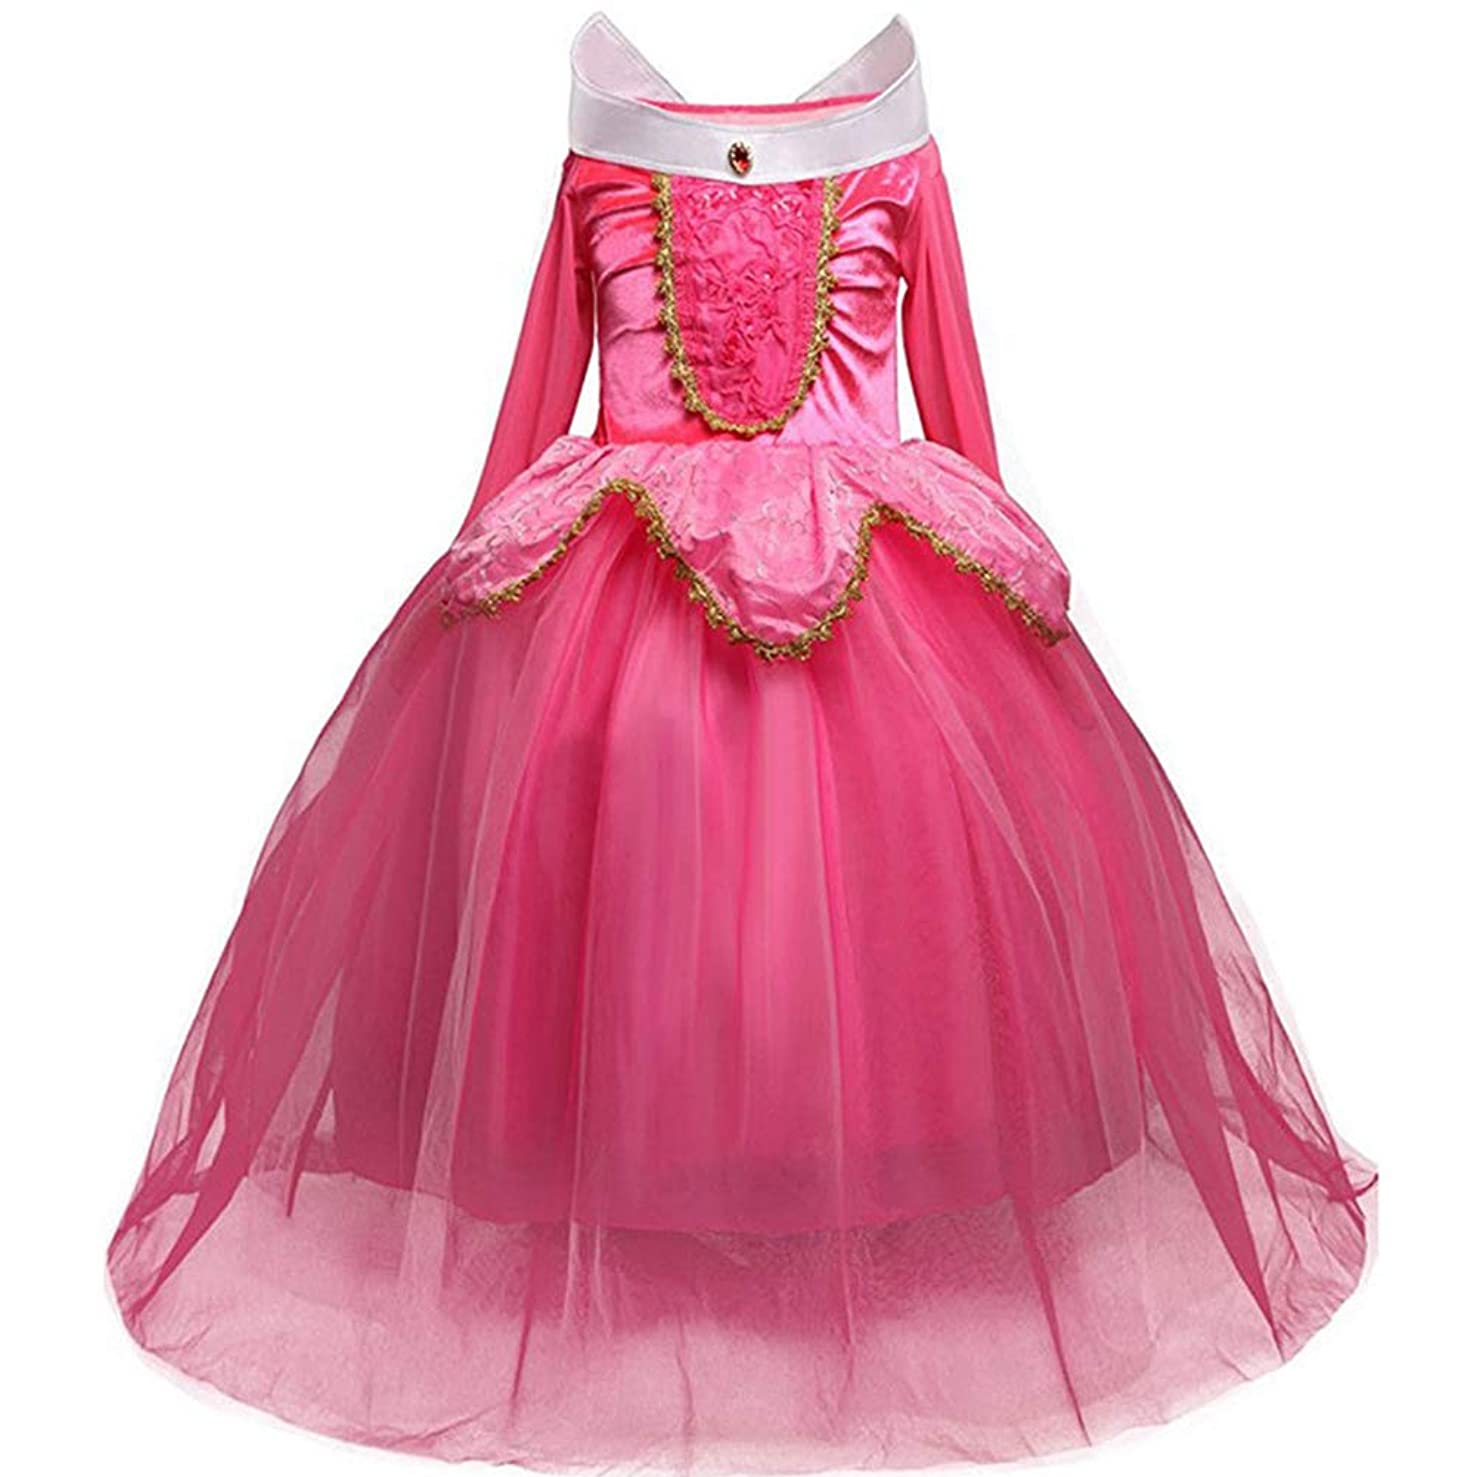 Fancy Dress, Girls' Princess Belle Costumes Princess Dress Up Halloween Costume Dress for Gilrls Age 4-9 Year (4 Years)